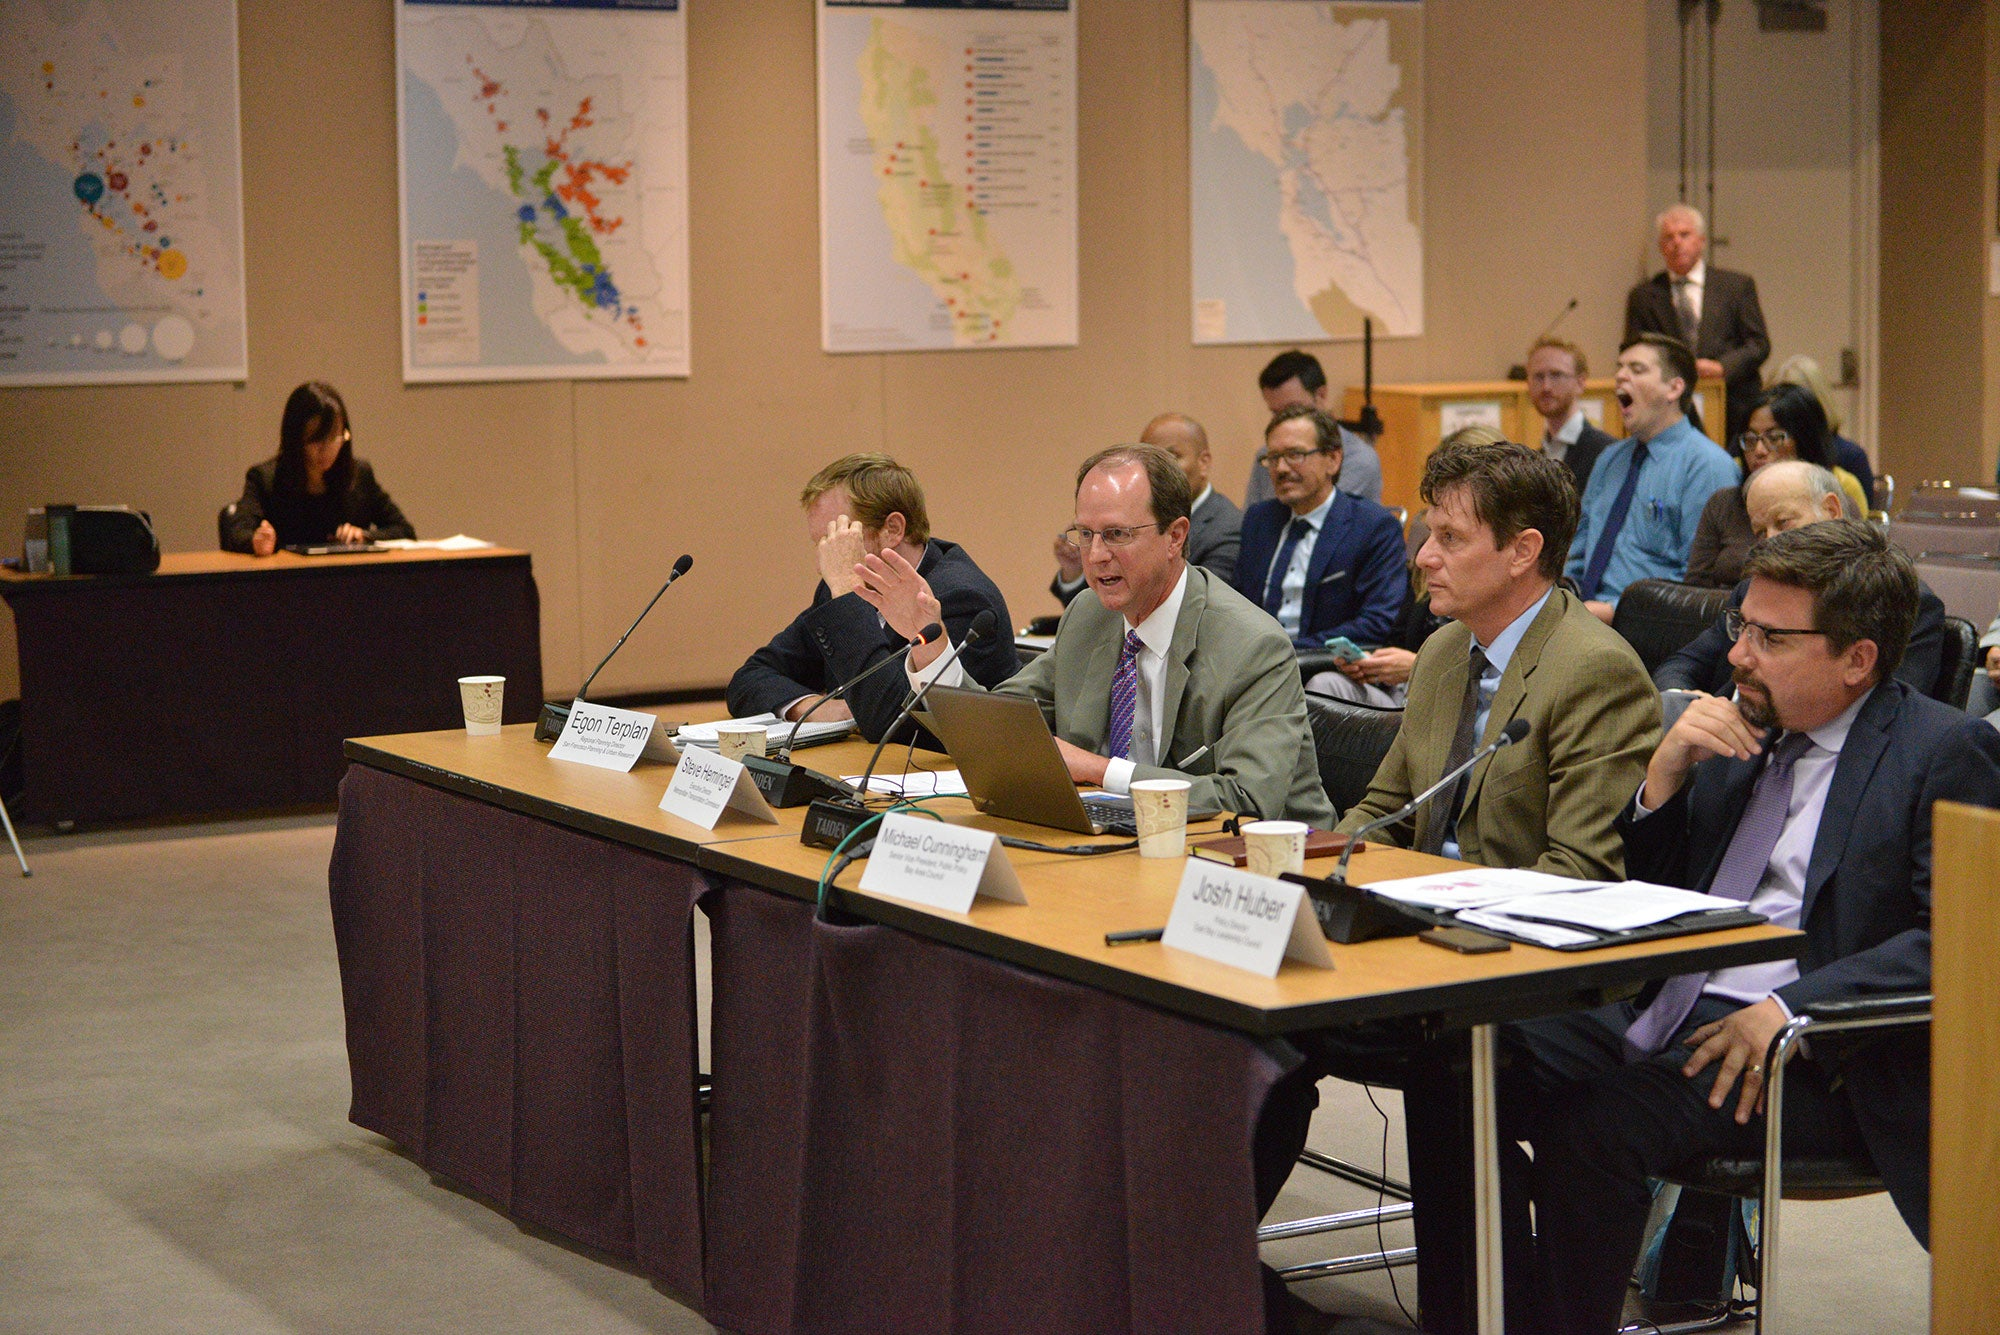 Egon Terplan, Steve Heminger, Michael Cunningham and Josh Huber at the 8/21 hearing